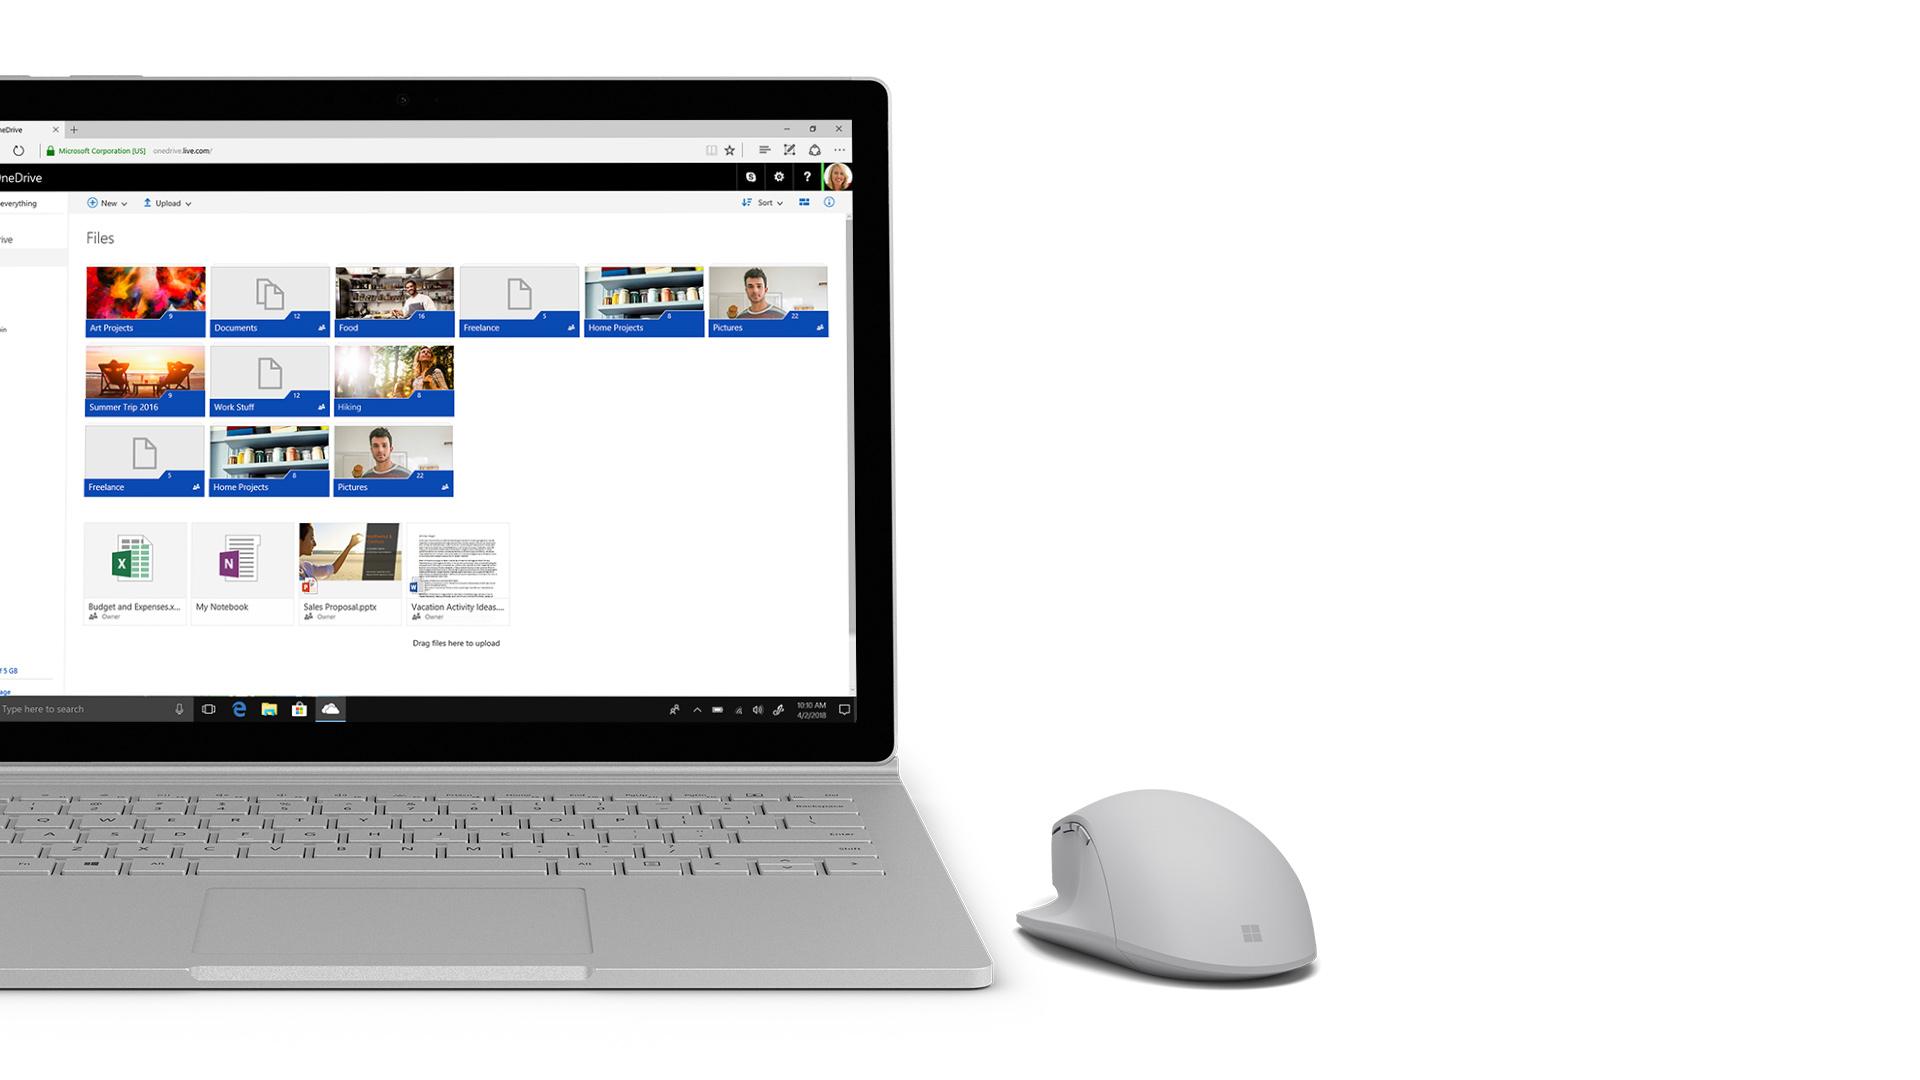 Surface 上的 OneDrive 螢幕擷取畫面。